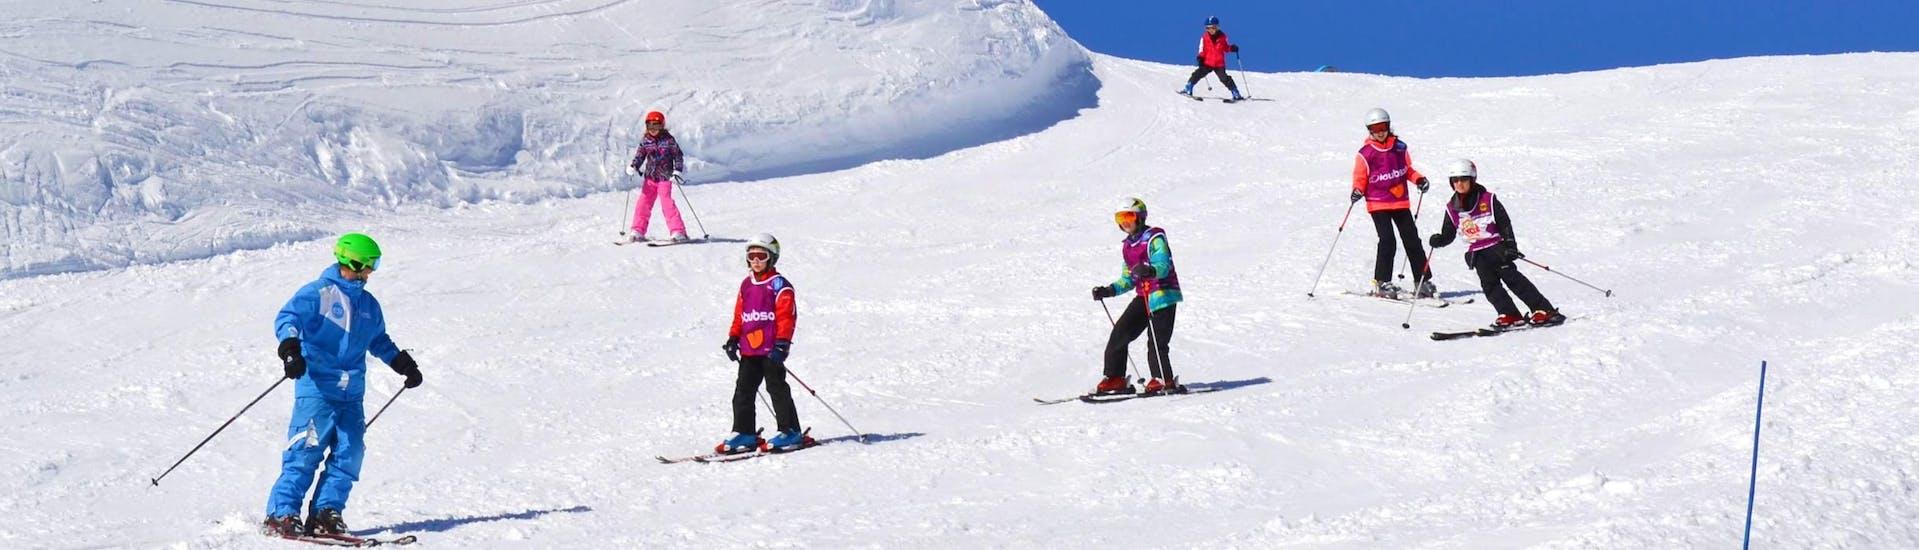 kids-ski-lessons-6-12-years-low-season-all-levels-esi-chatel-hero